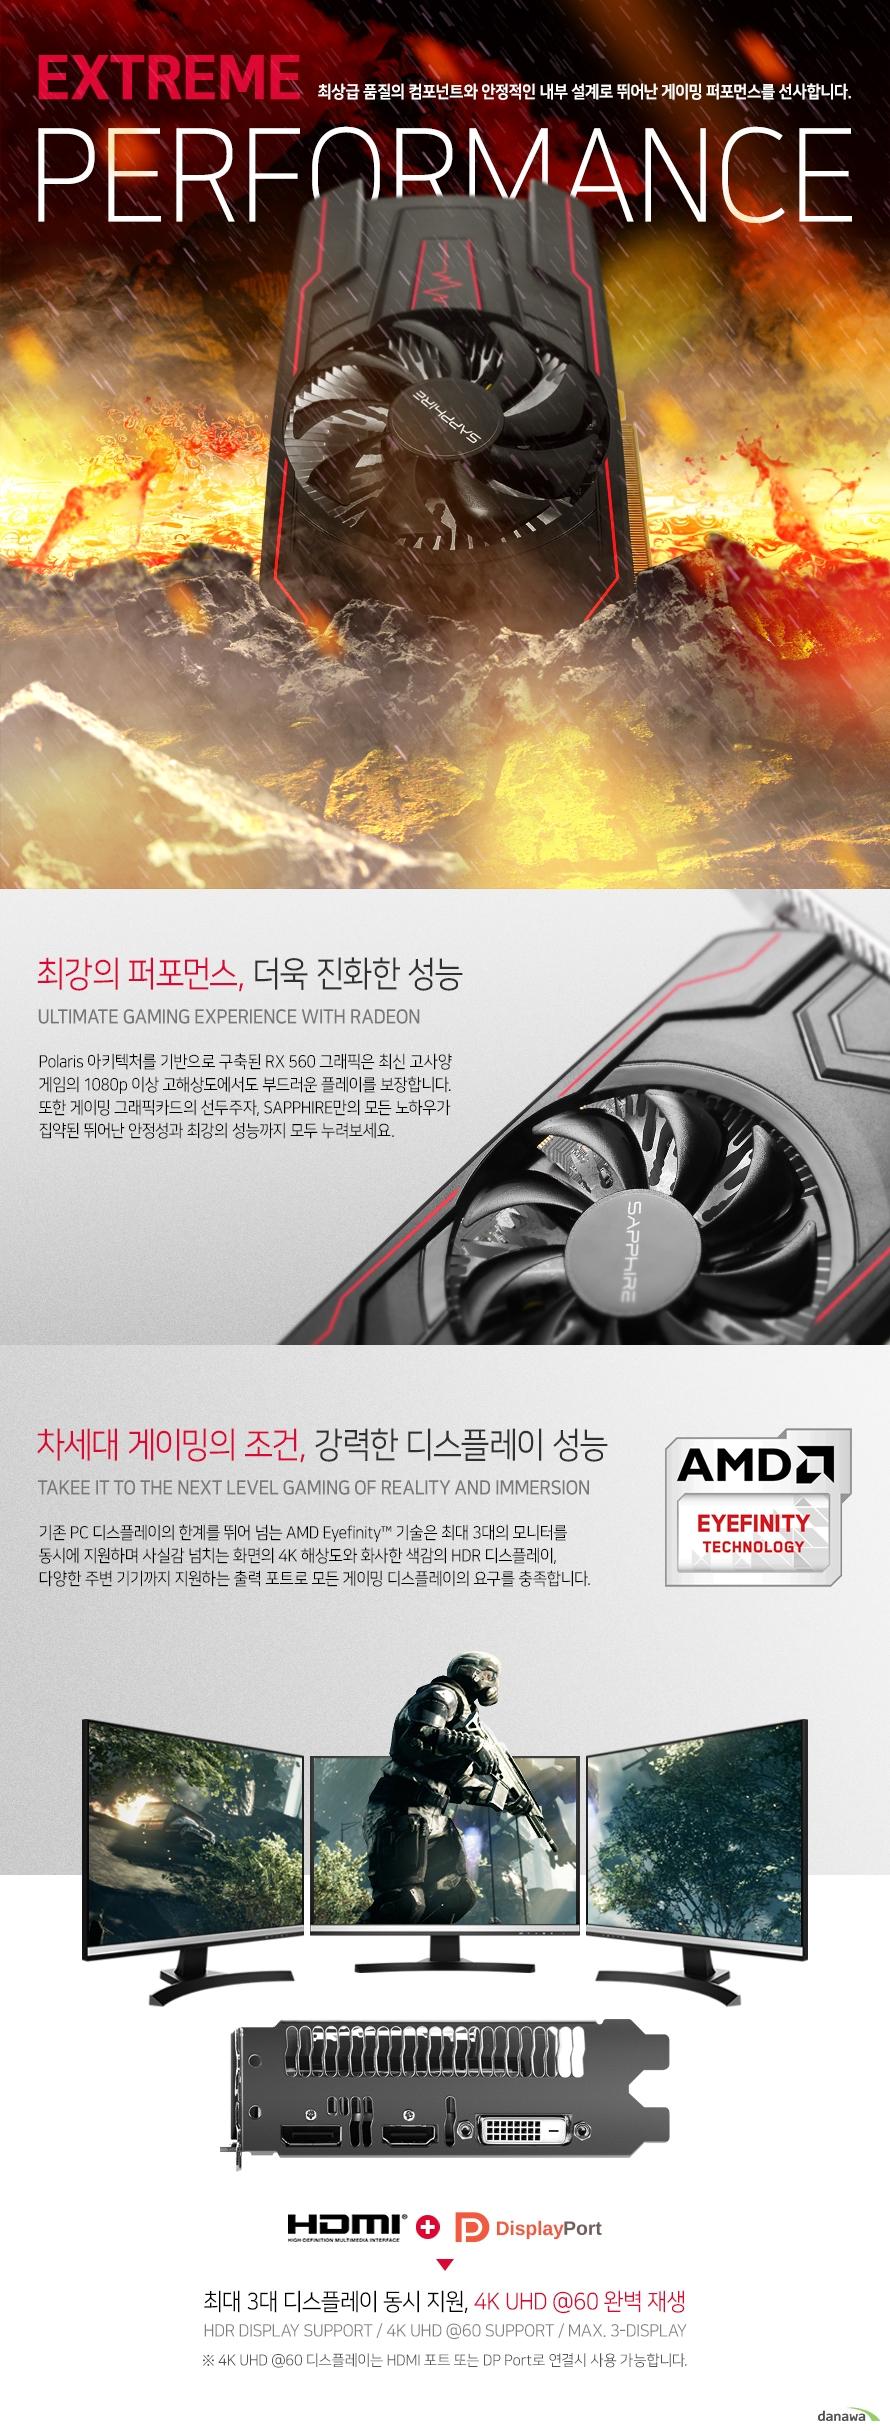 Polaris 아키텍처를 기반으로 구축된 RX 560 그래픽은 최신 고사양 게임의 1080p 이상 고해상도에서도 부드러운 플레이를 보장합니다. 또한 게이밍 그래픽카드의 선두주자, SAPPHIRE만의 모든 노하우가 집약된 뛰어난 안정성과 최강의 성능까지 모두 누려보세요.